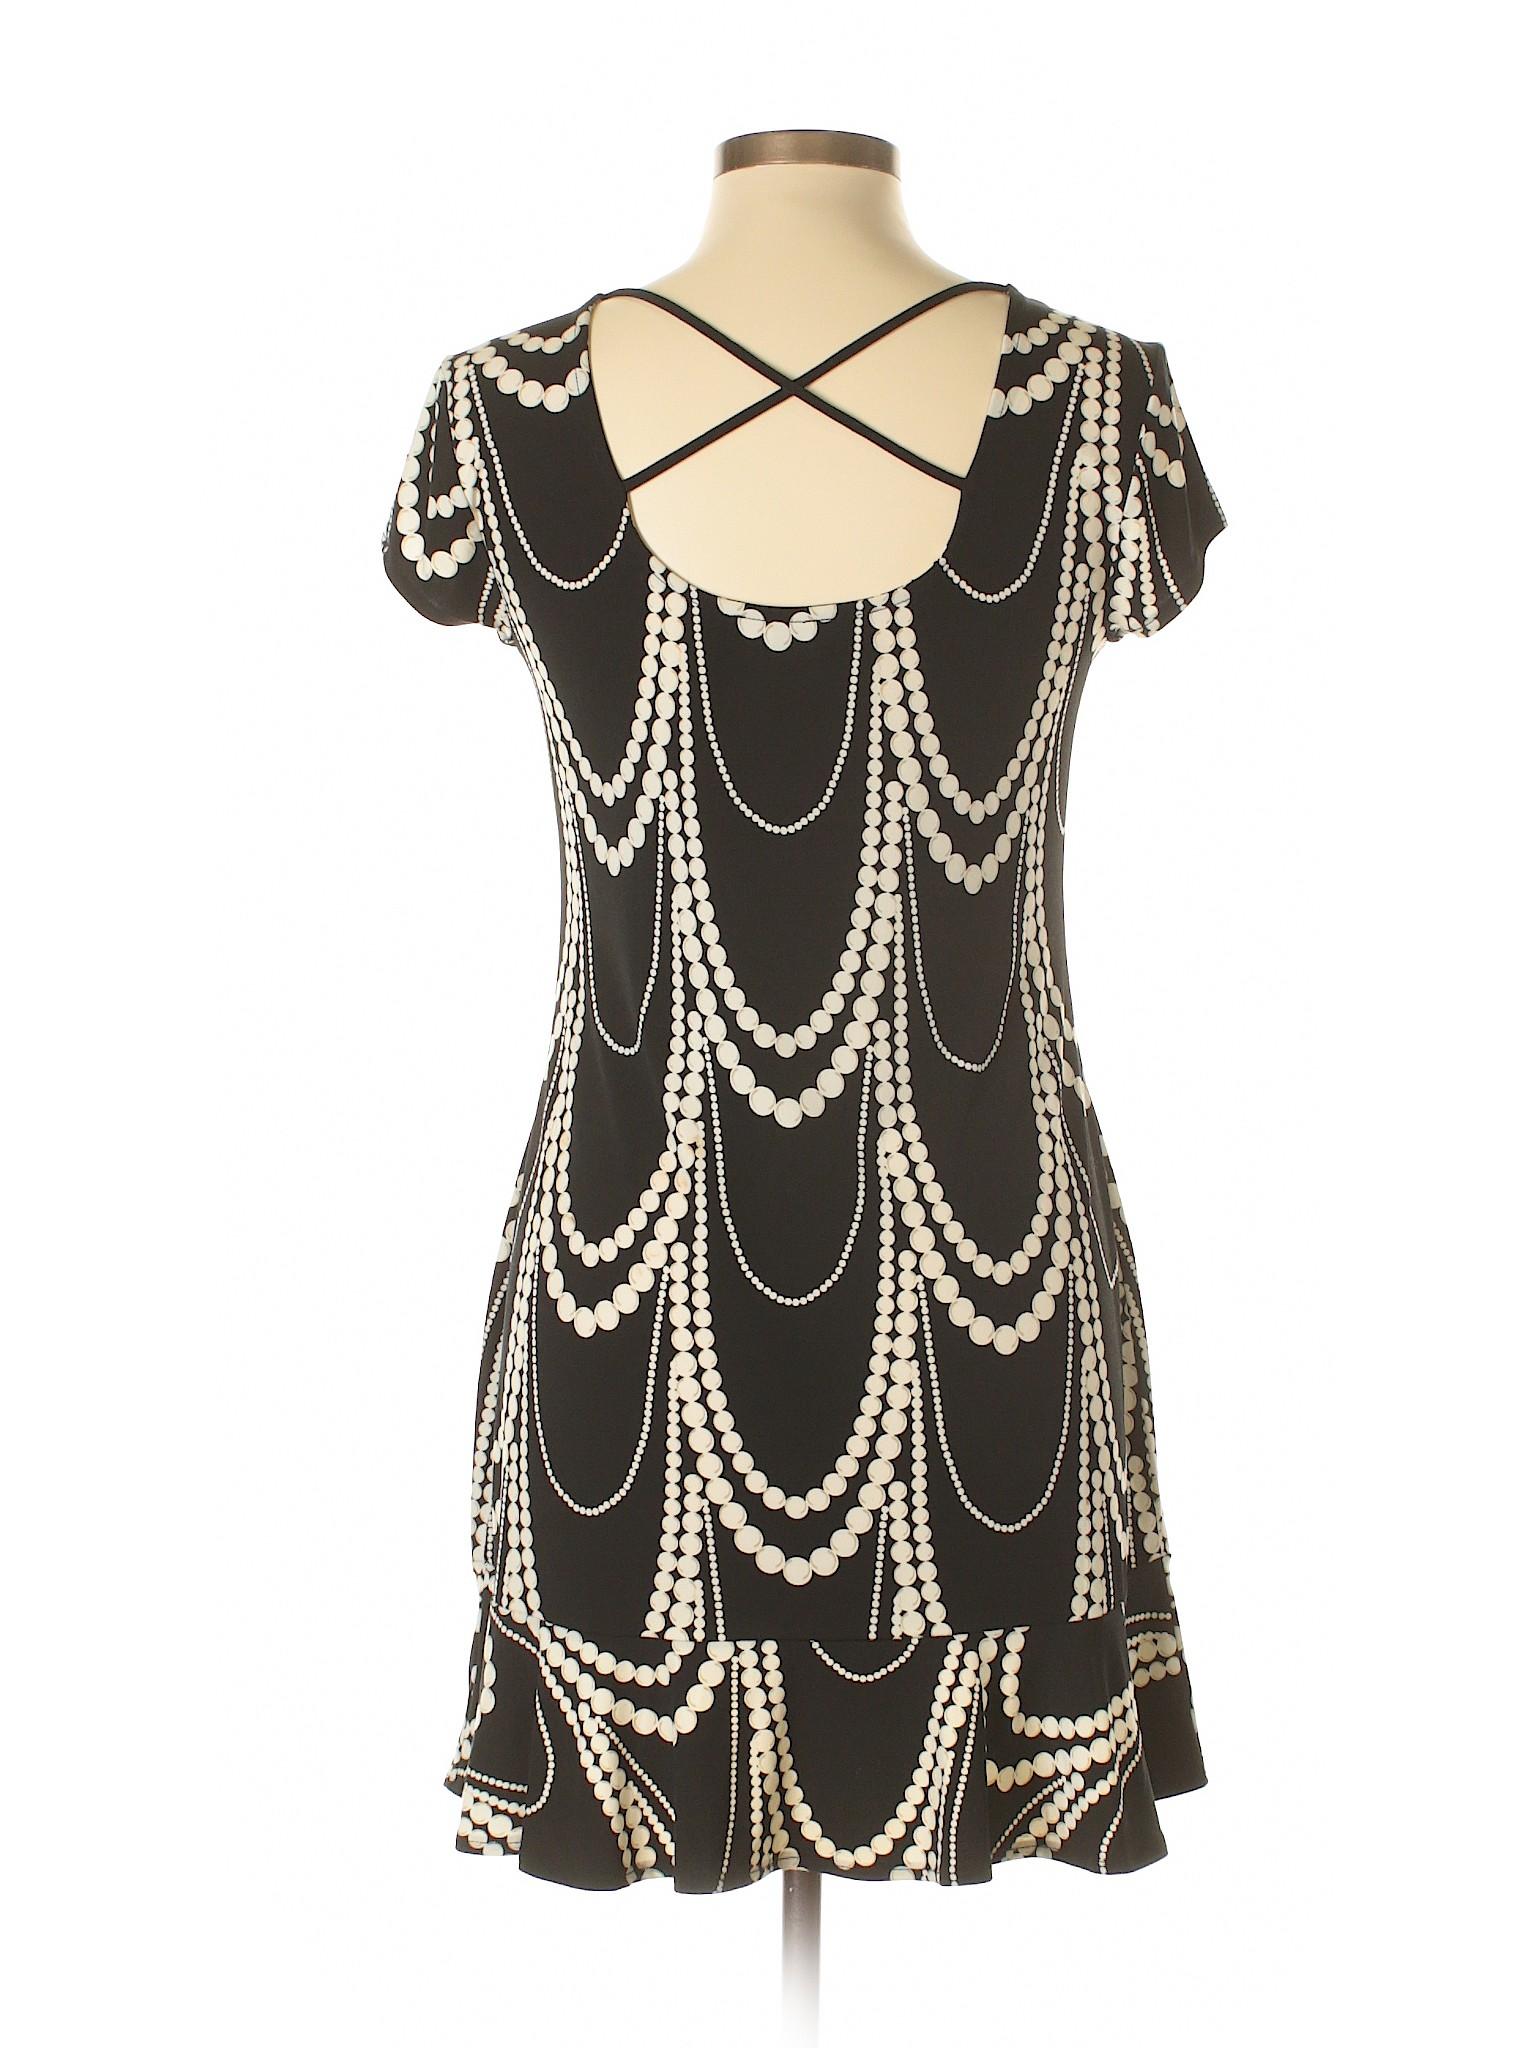 Black House White Dress Market Casual Selling xq0EnCaw5a